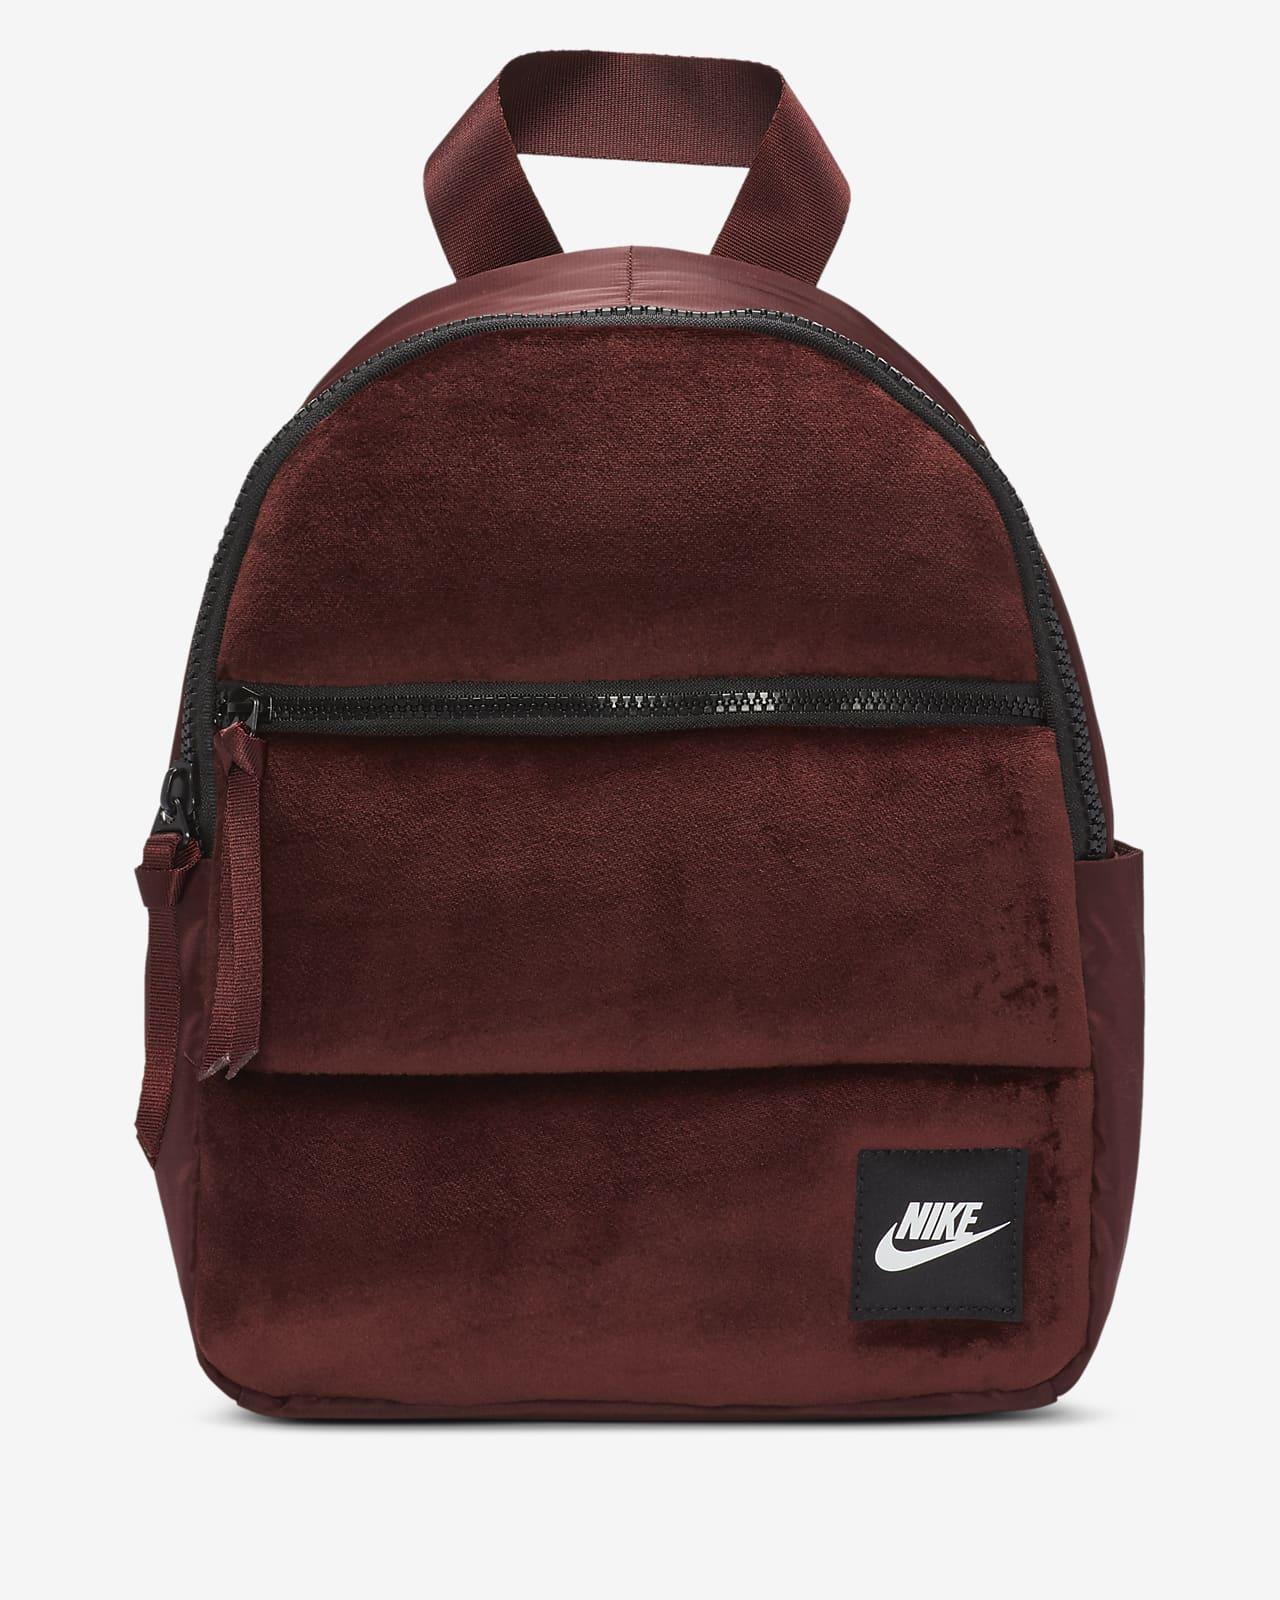 Nike Sportswear Essentials Winterized Mini Backpack